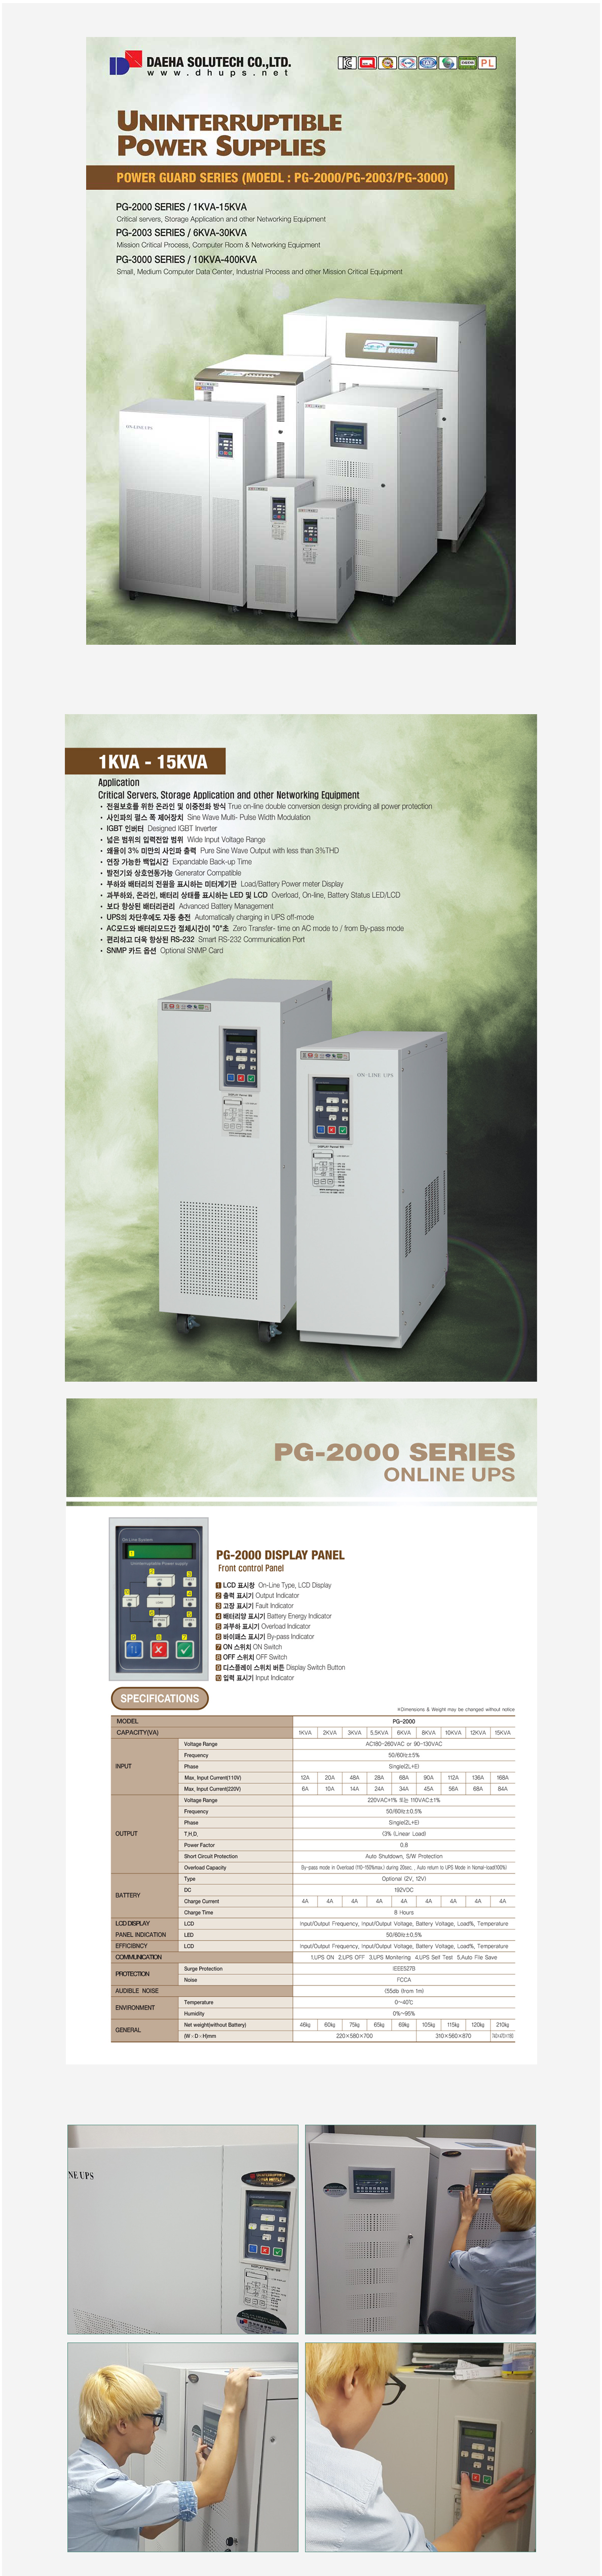 Daeha Solutech UPS (Uninterruptible Power Supply) PG-Series